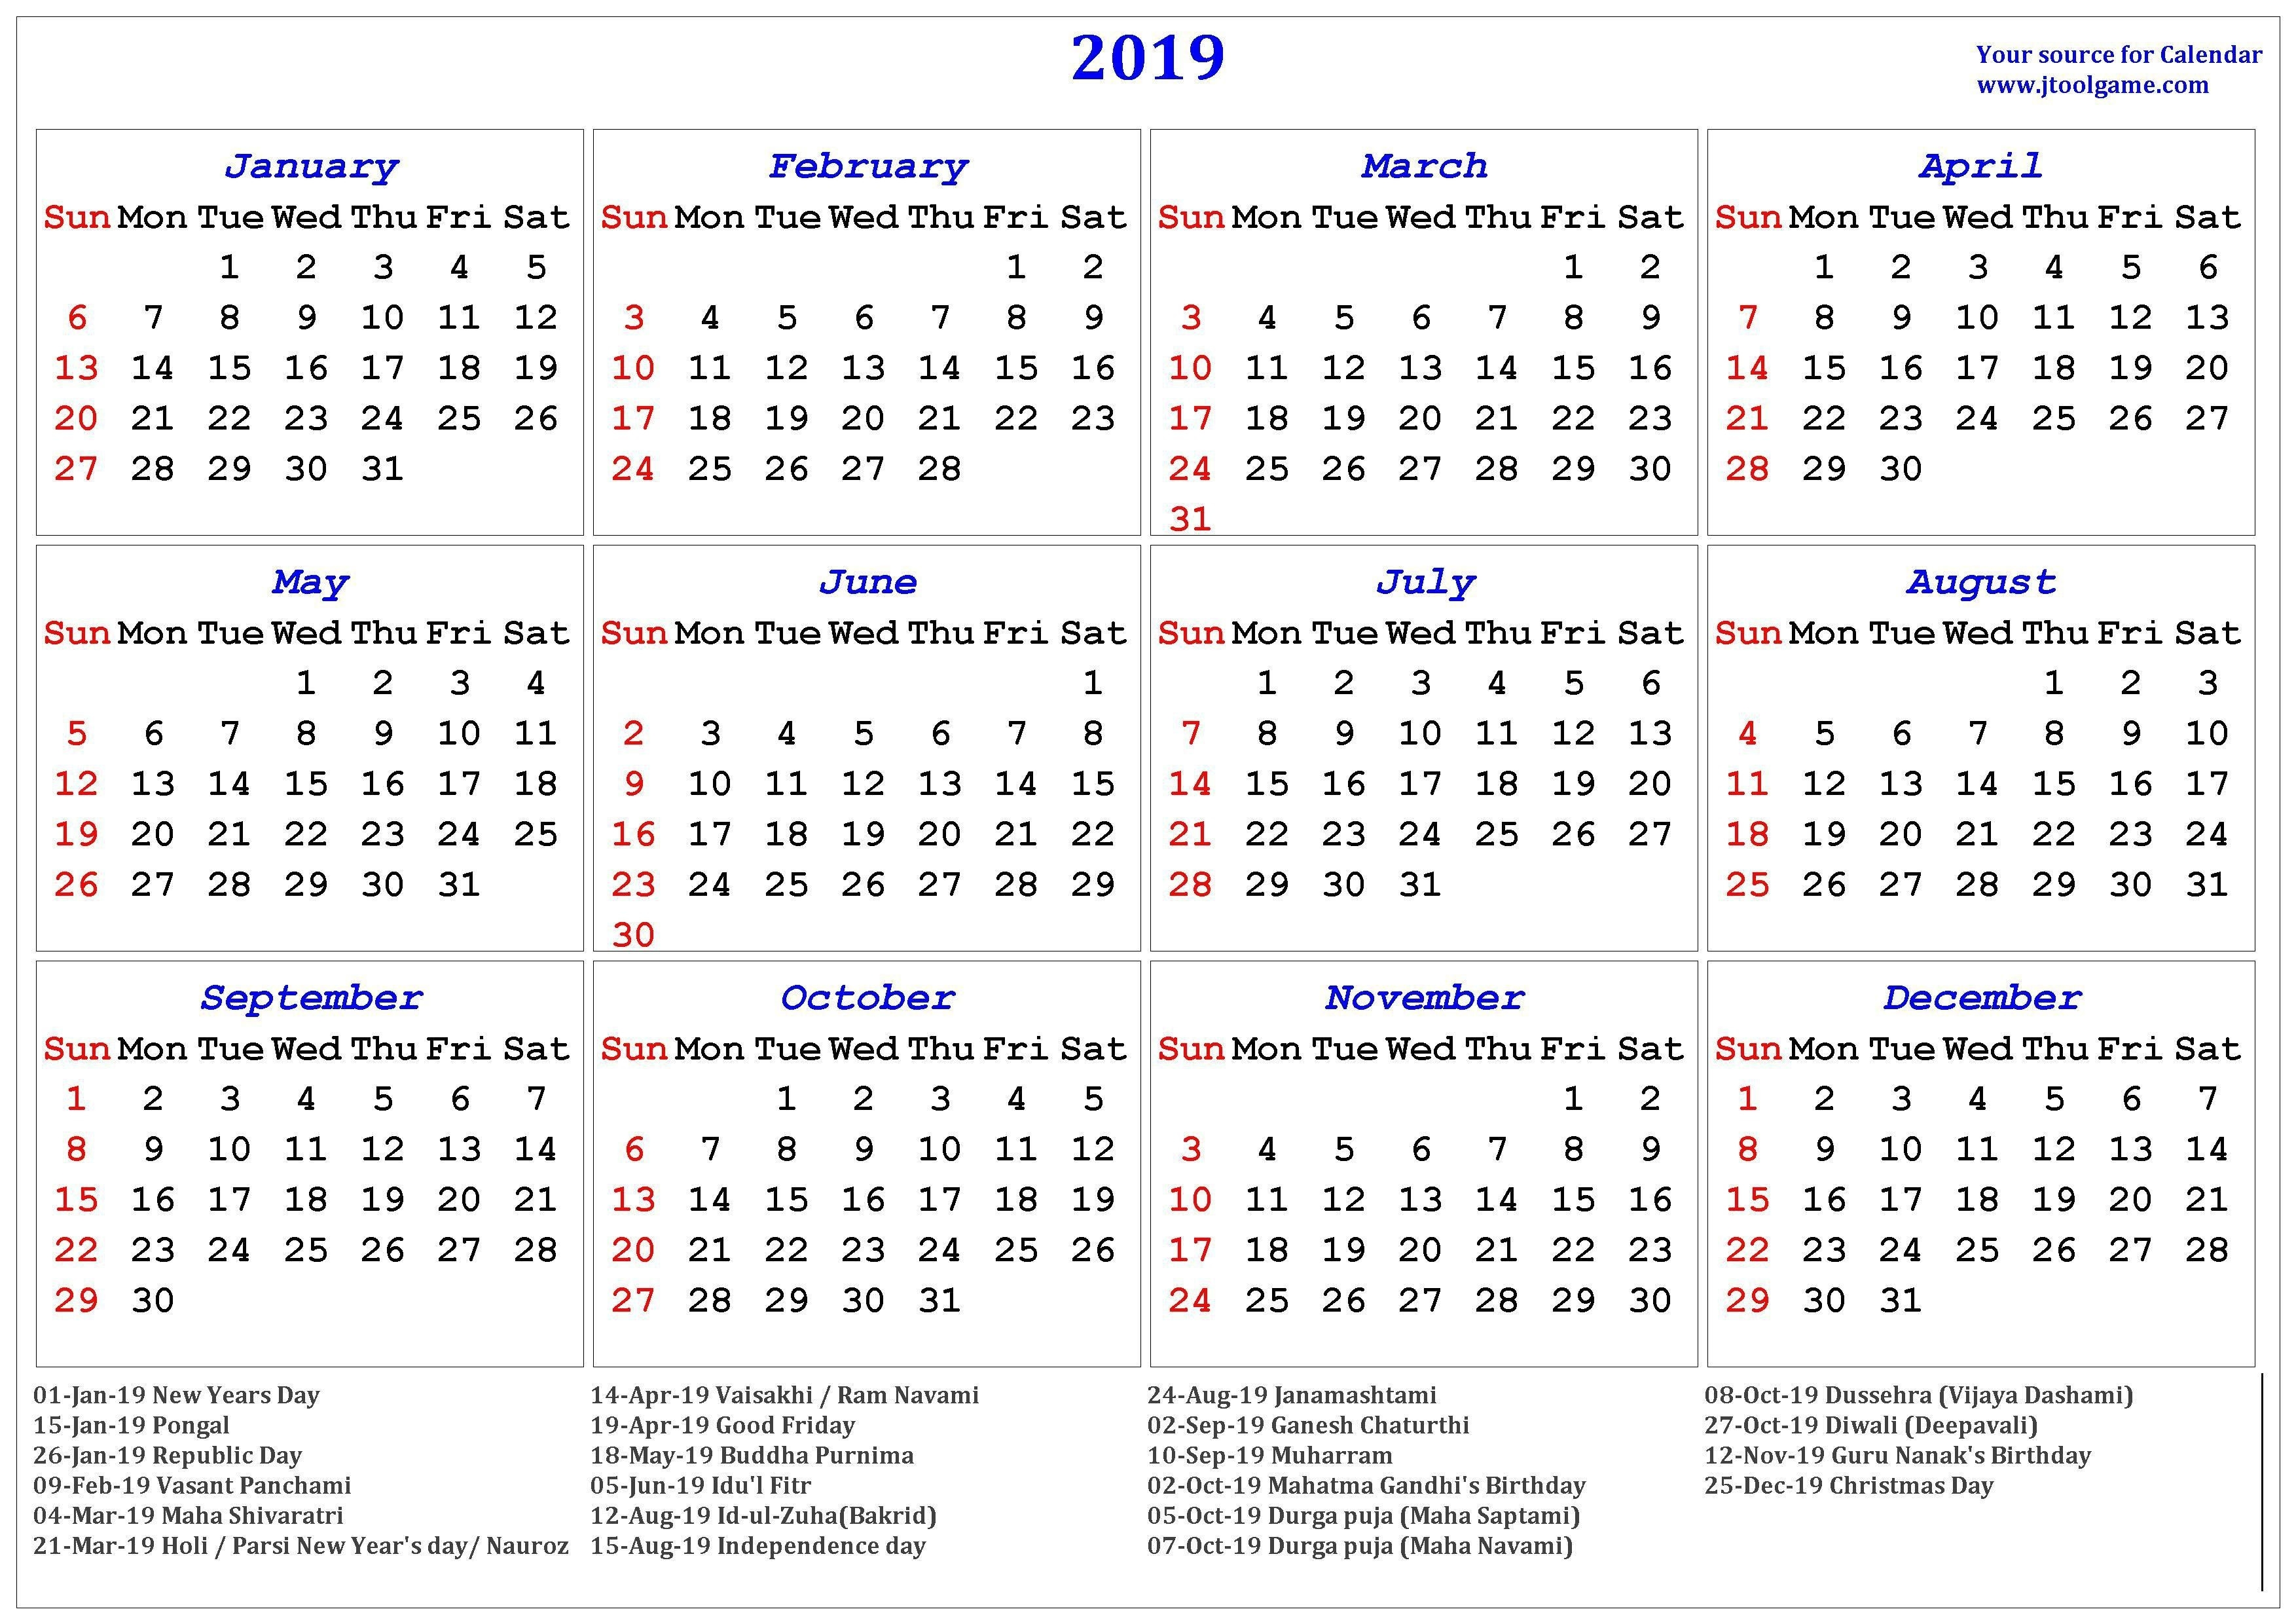 2019 Hindu Calendar With Tithi | Tyohar, Holidays, Festivals-Gujarati Calendar 2020 January To December